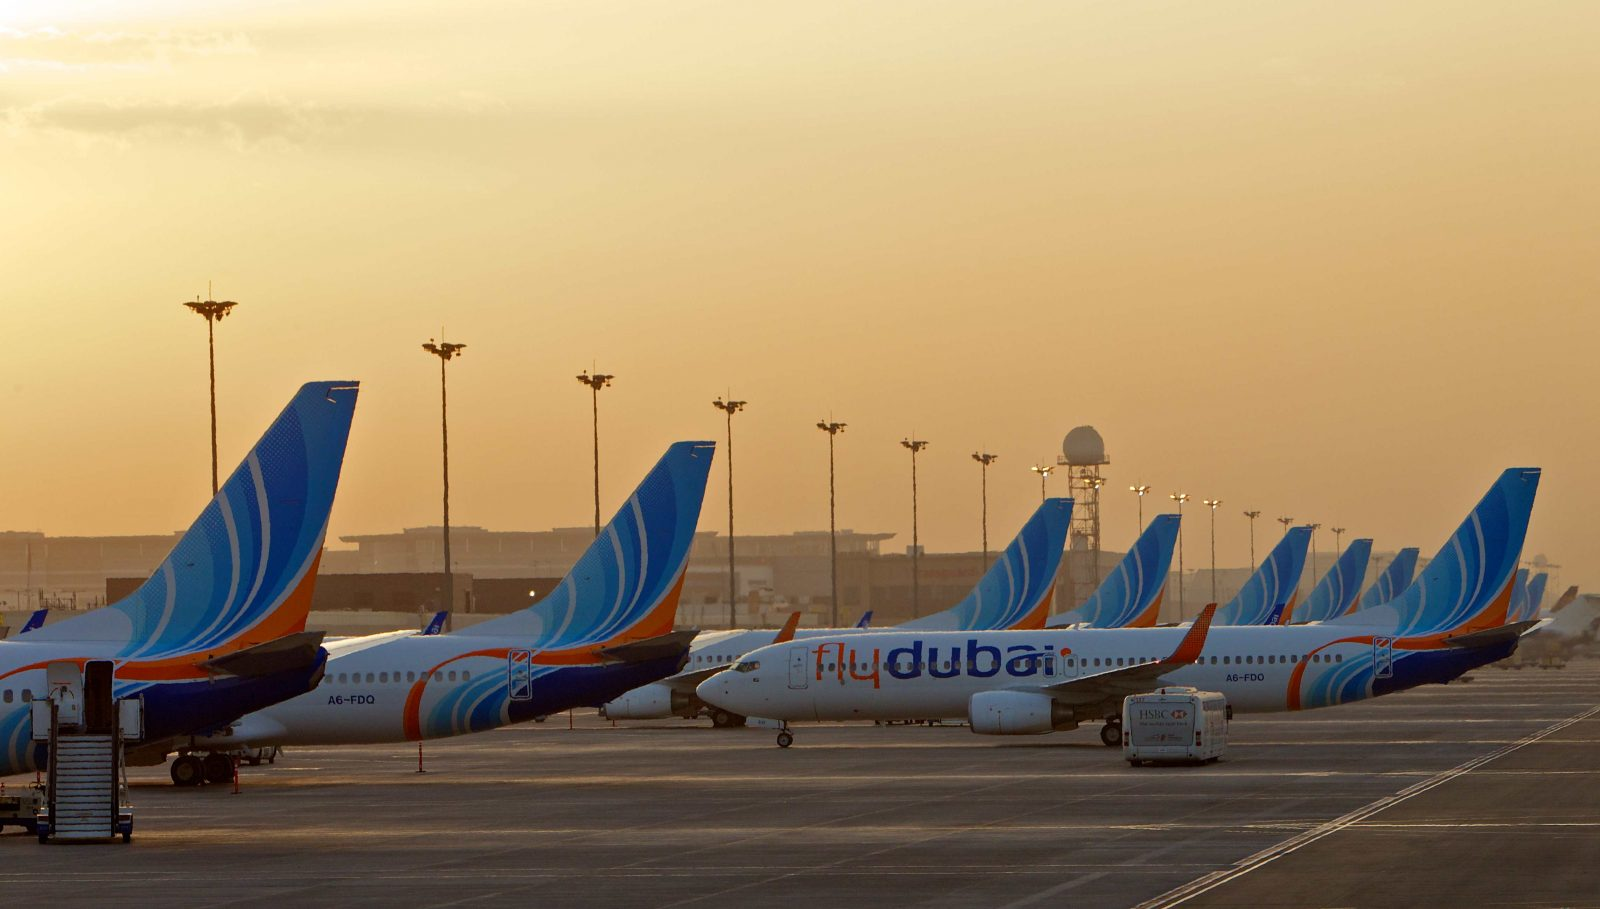 Emirati Airline Fly Dubai To Start Flights To Israel